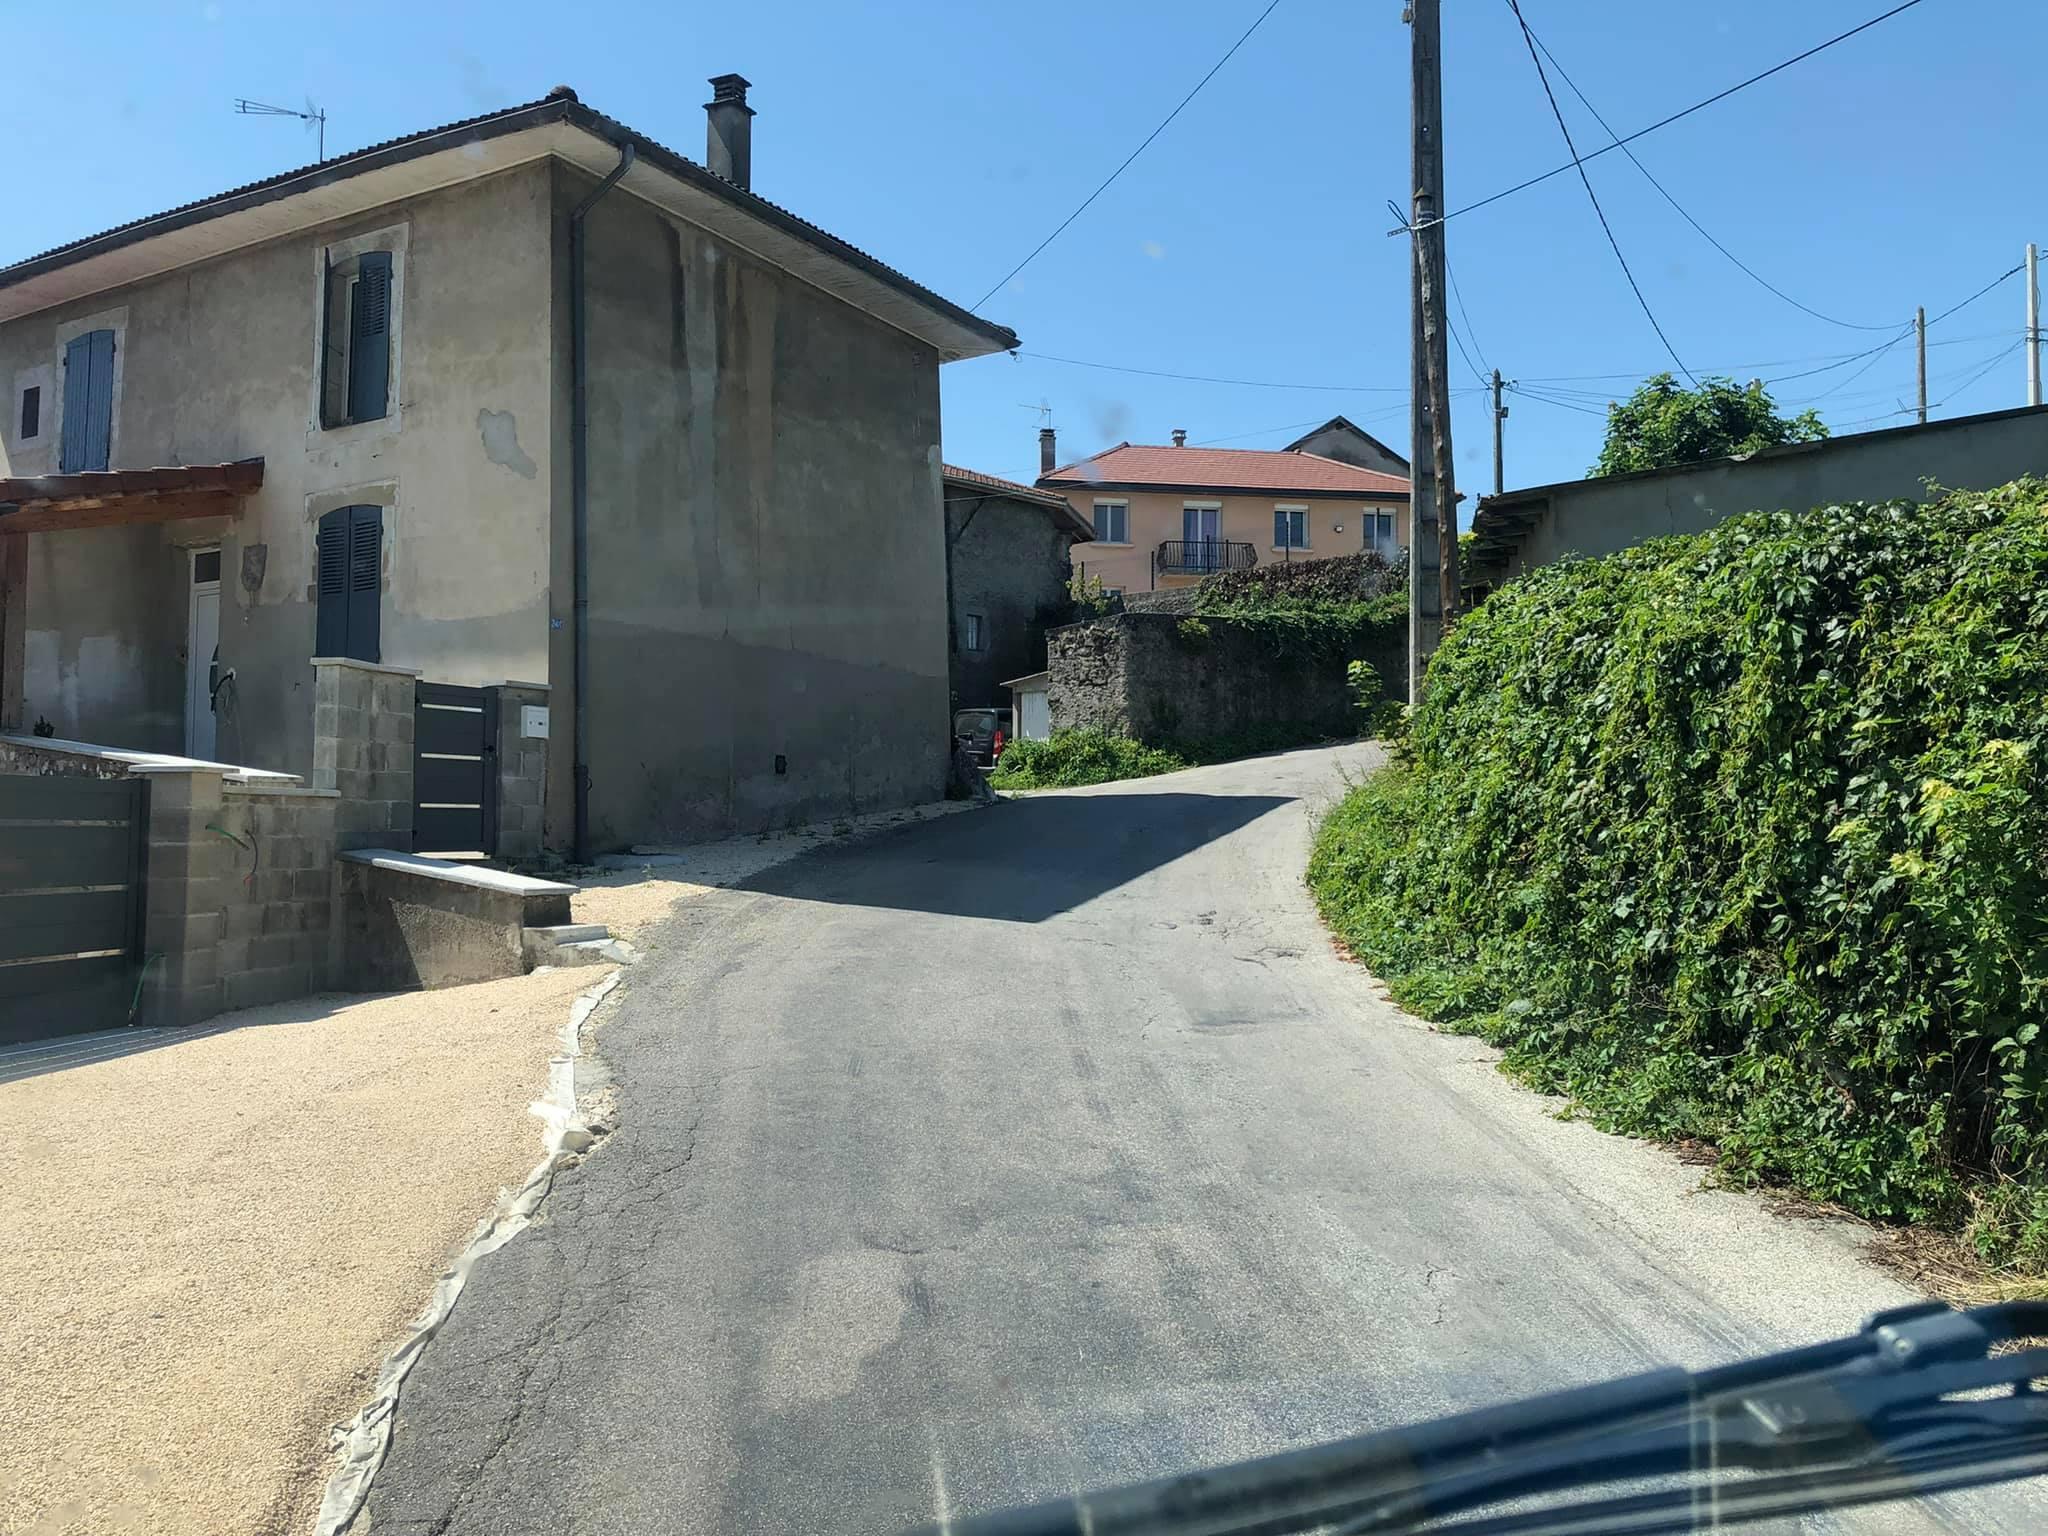 Lyon-Grenoble-lossen-Mantmelian-laden--(9)